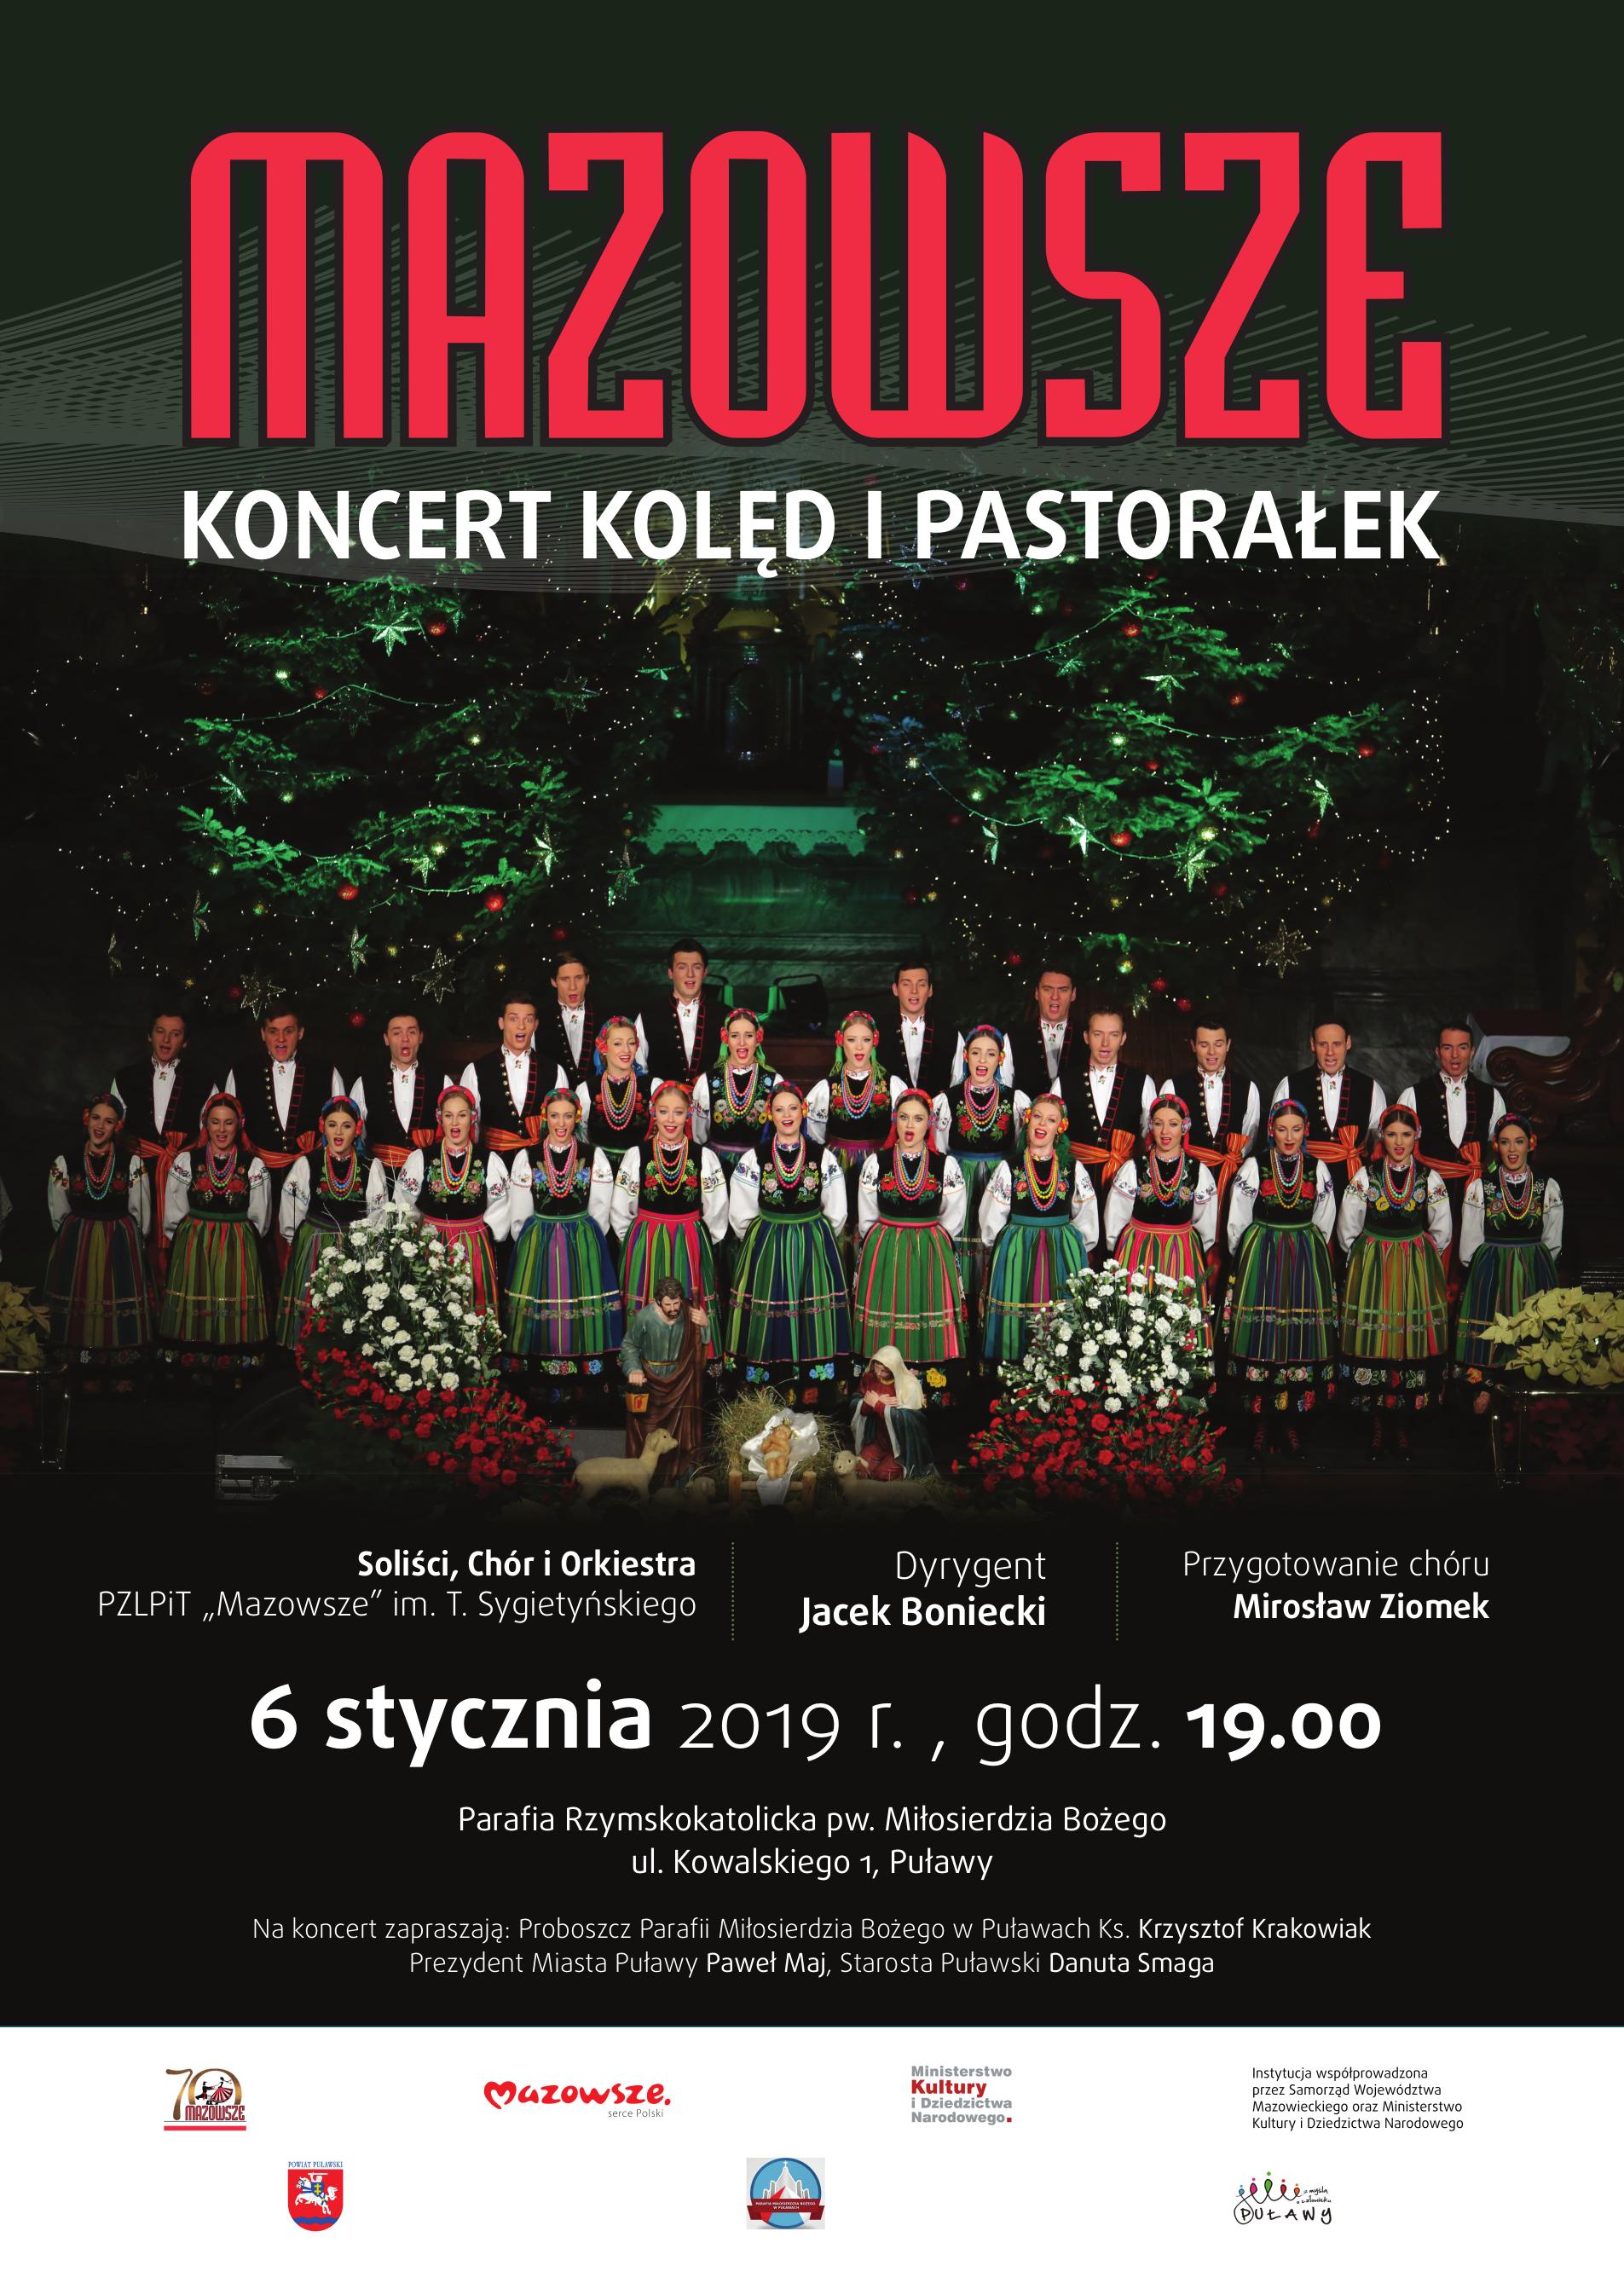 Koncert Kolęd i Pastorałek Mazowsze